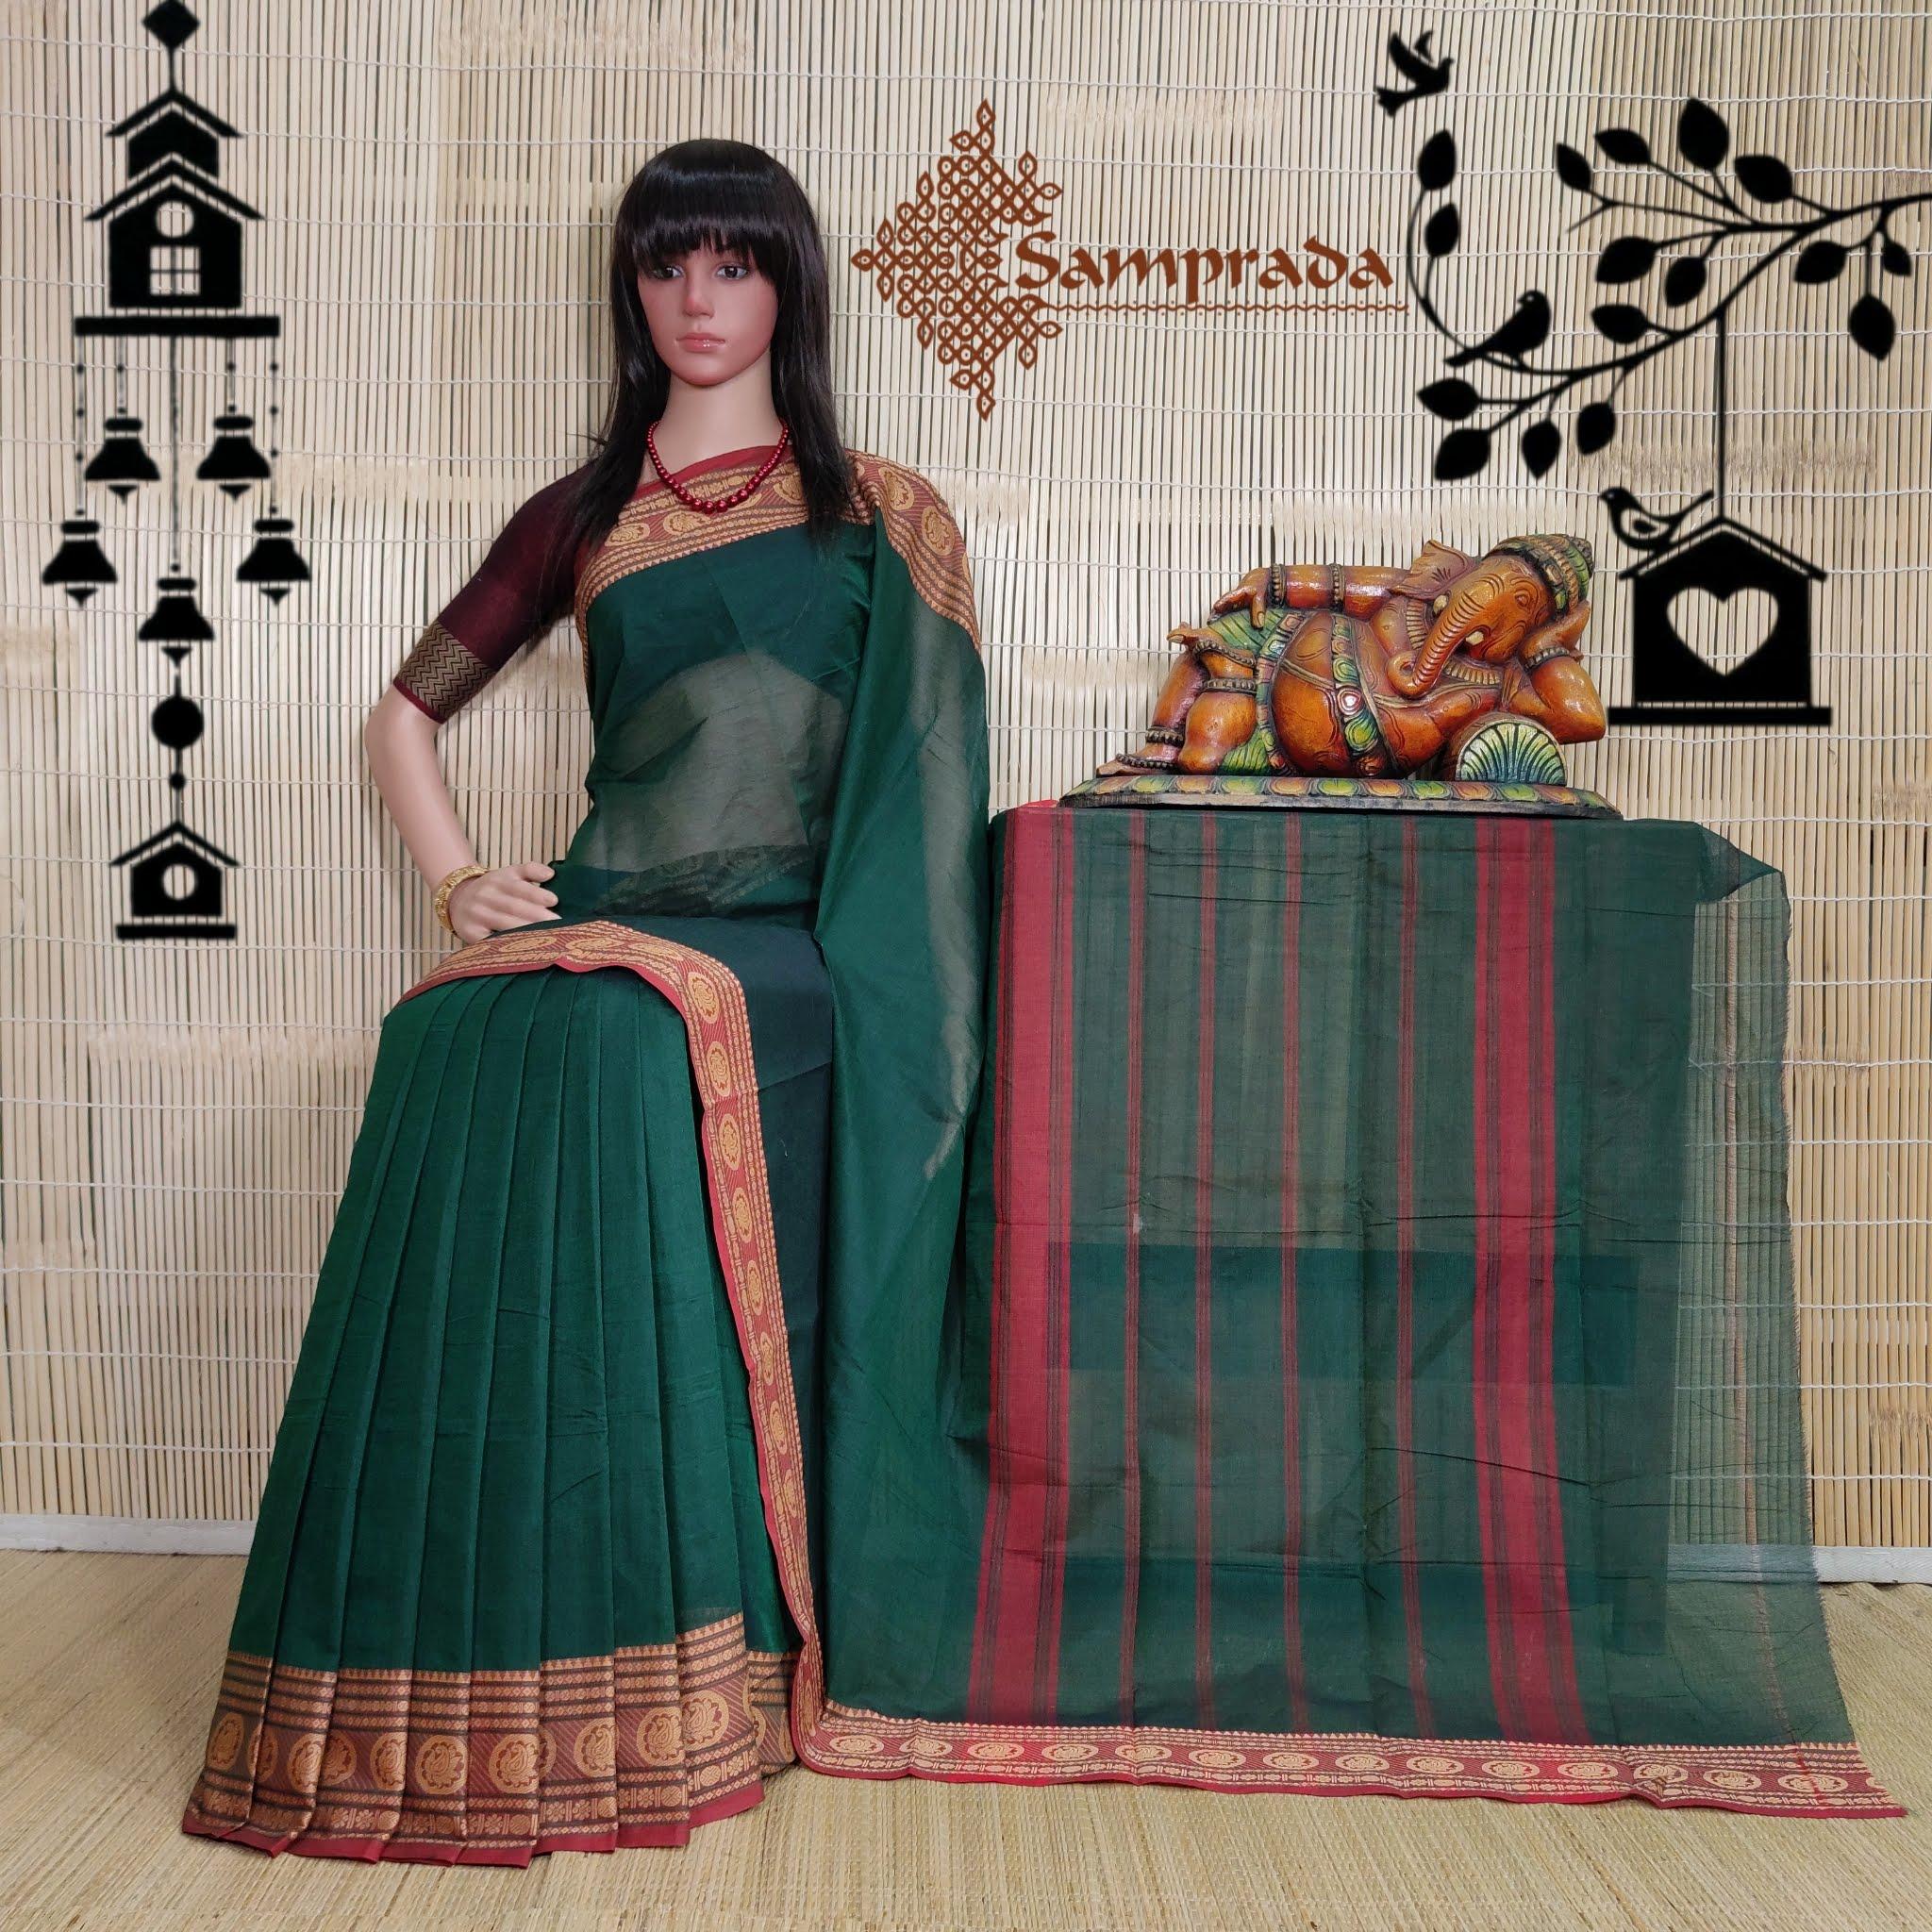 Samridha - South Cotton Saree